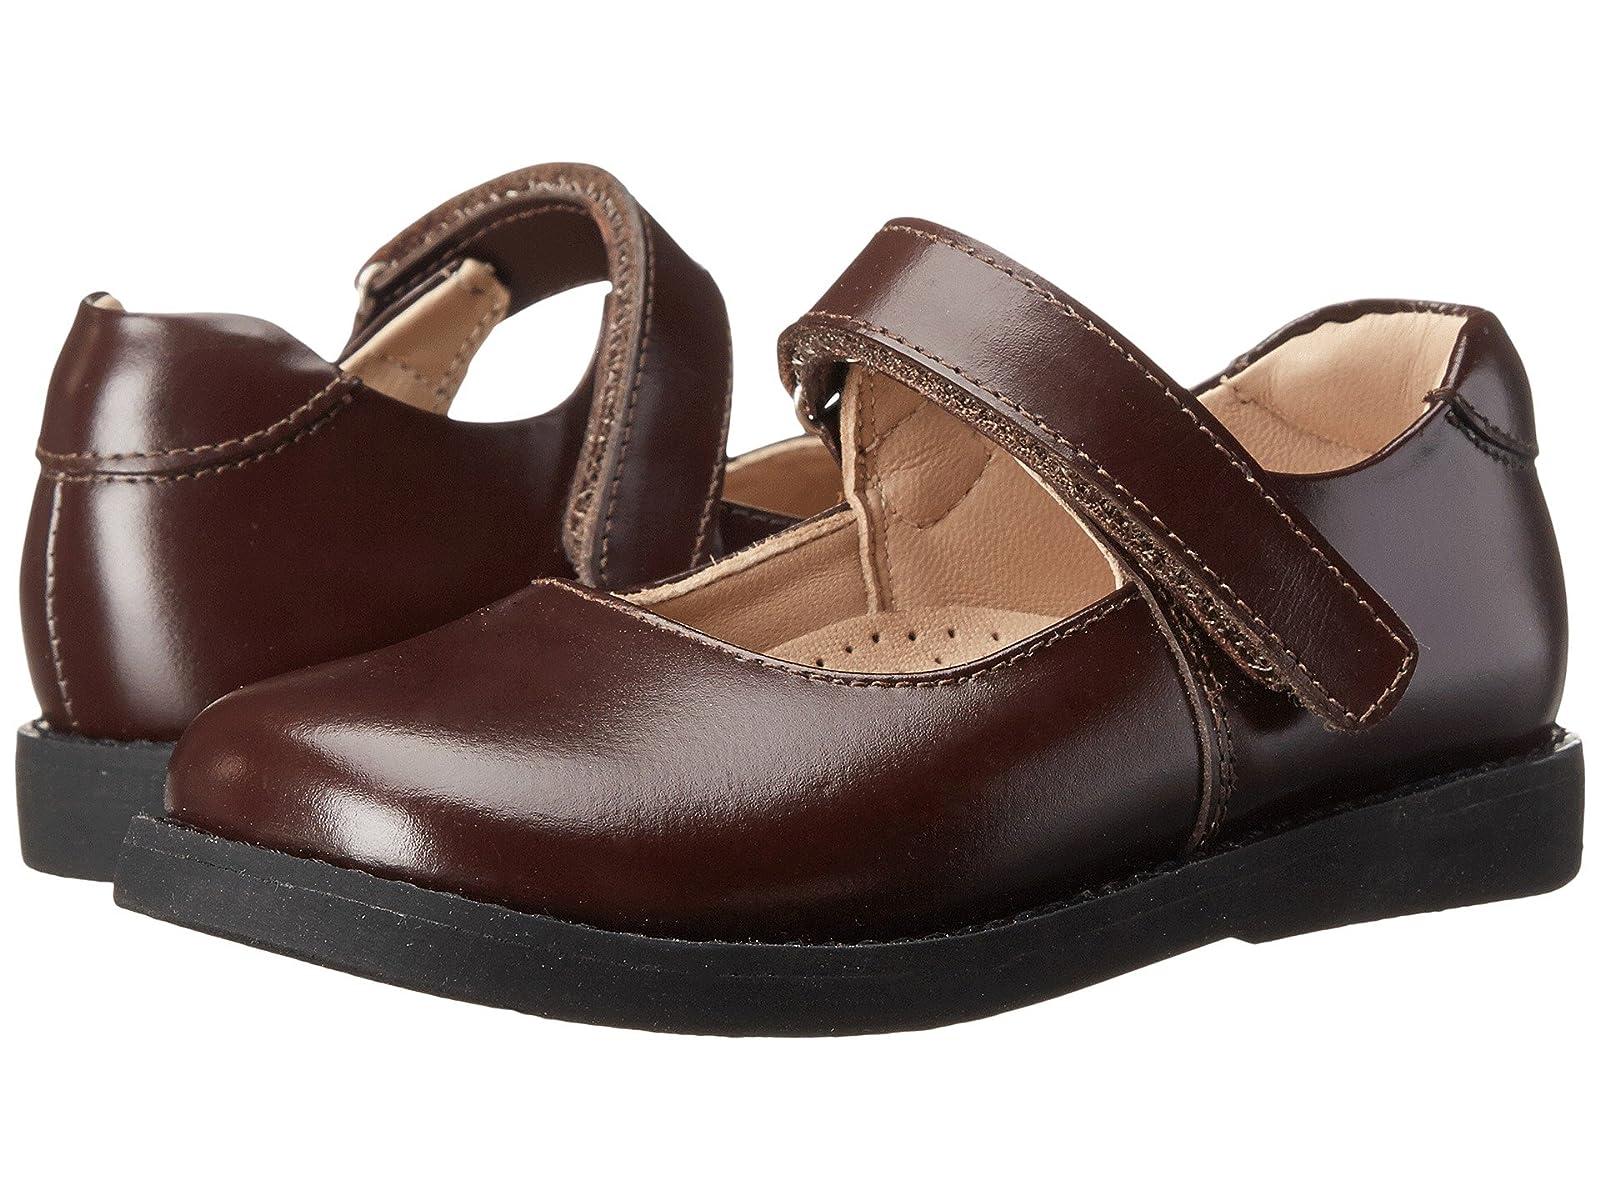 Elephantito Scholar Mary Jane (Toddler/Little Kid/Big Kid)Atmospheric grades have affordable shoes